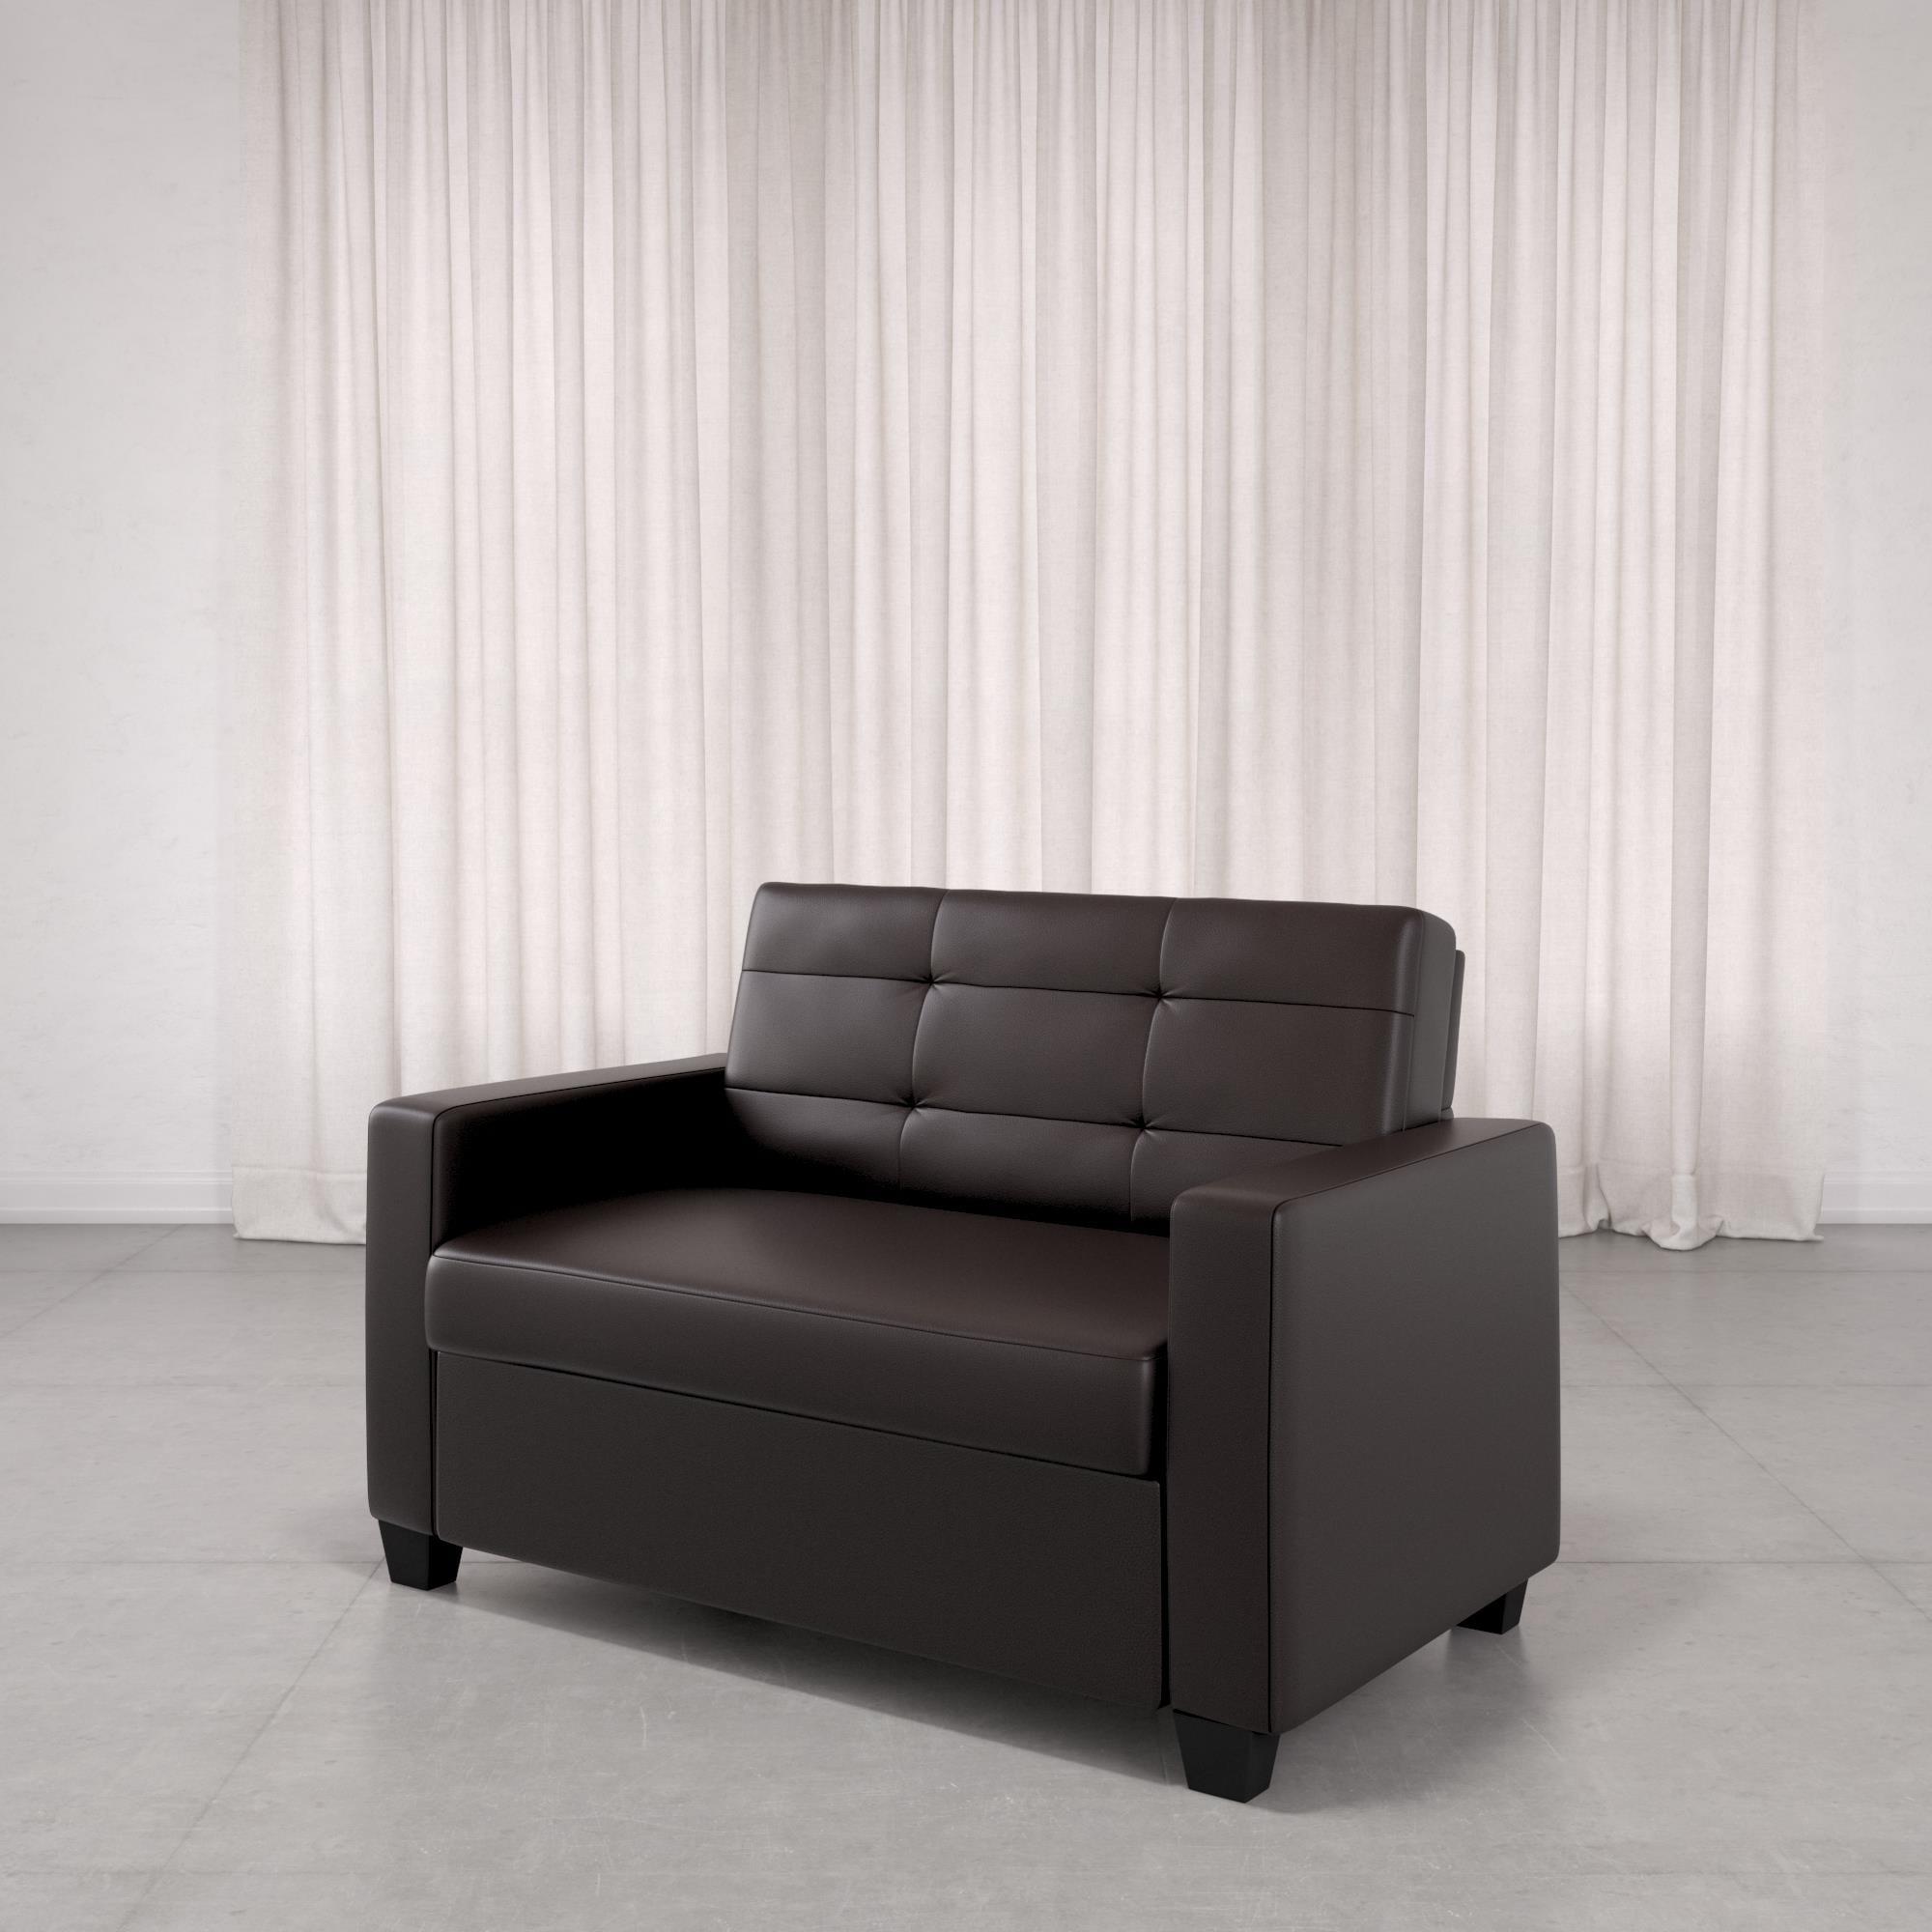 Picture of: Mainstays Loveseat Sleeper Sofa Twin Chocolate Faux Leather Walmart Com Walmart Com